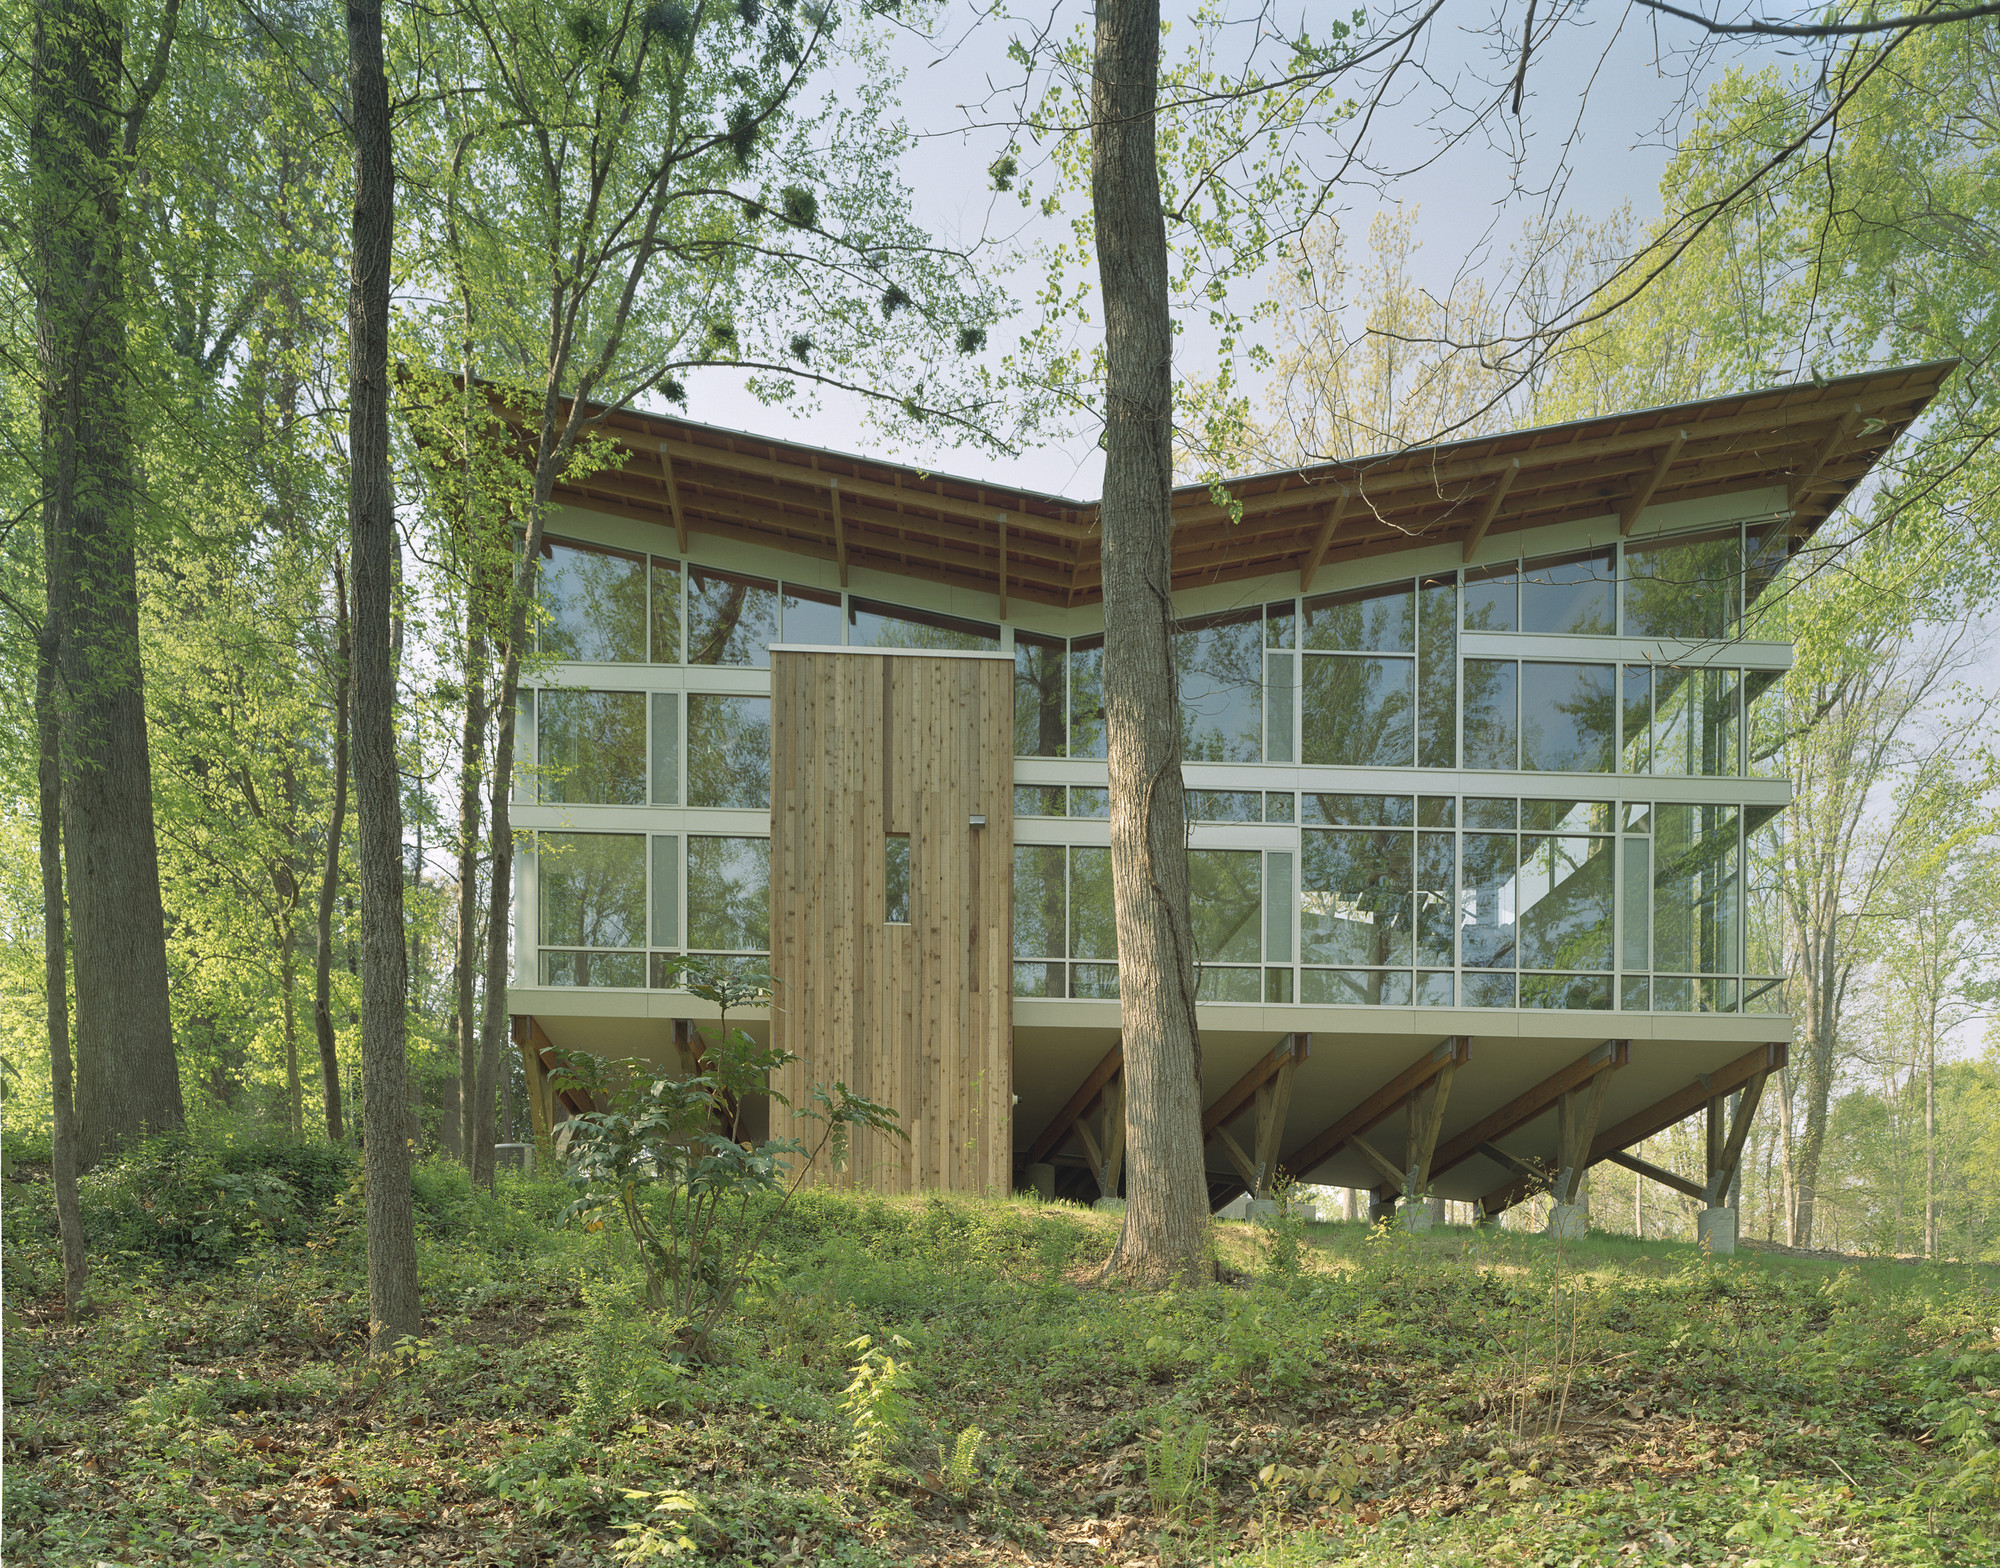 Strickland-Ferris Residence / Frank Harmon Architect, © Tim Hursley